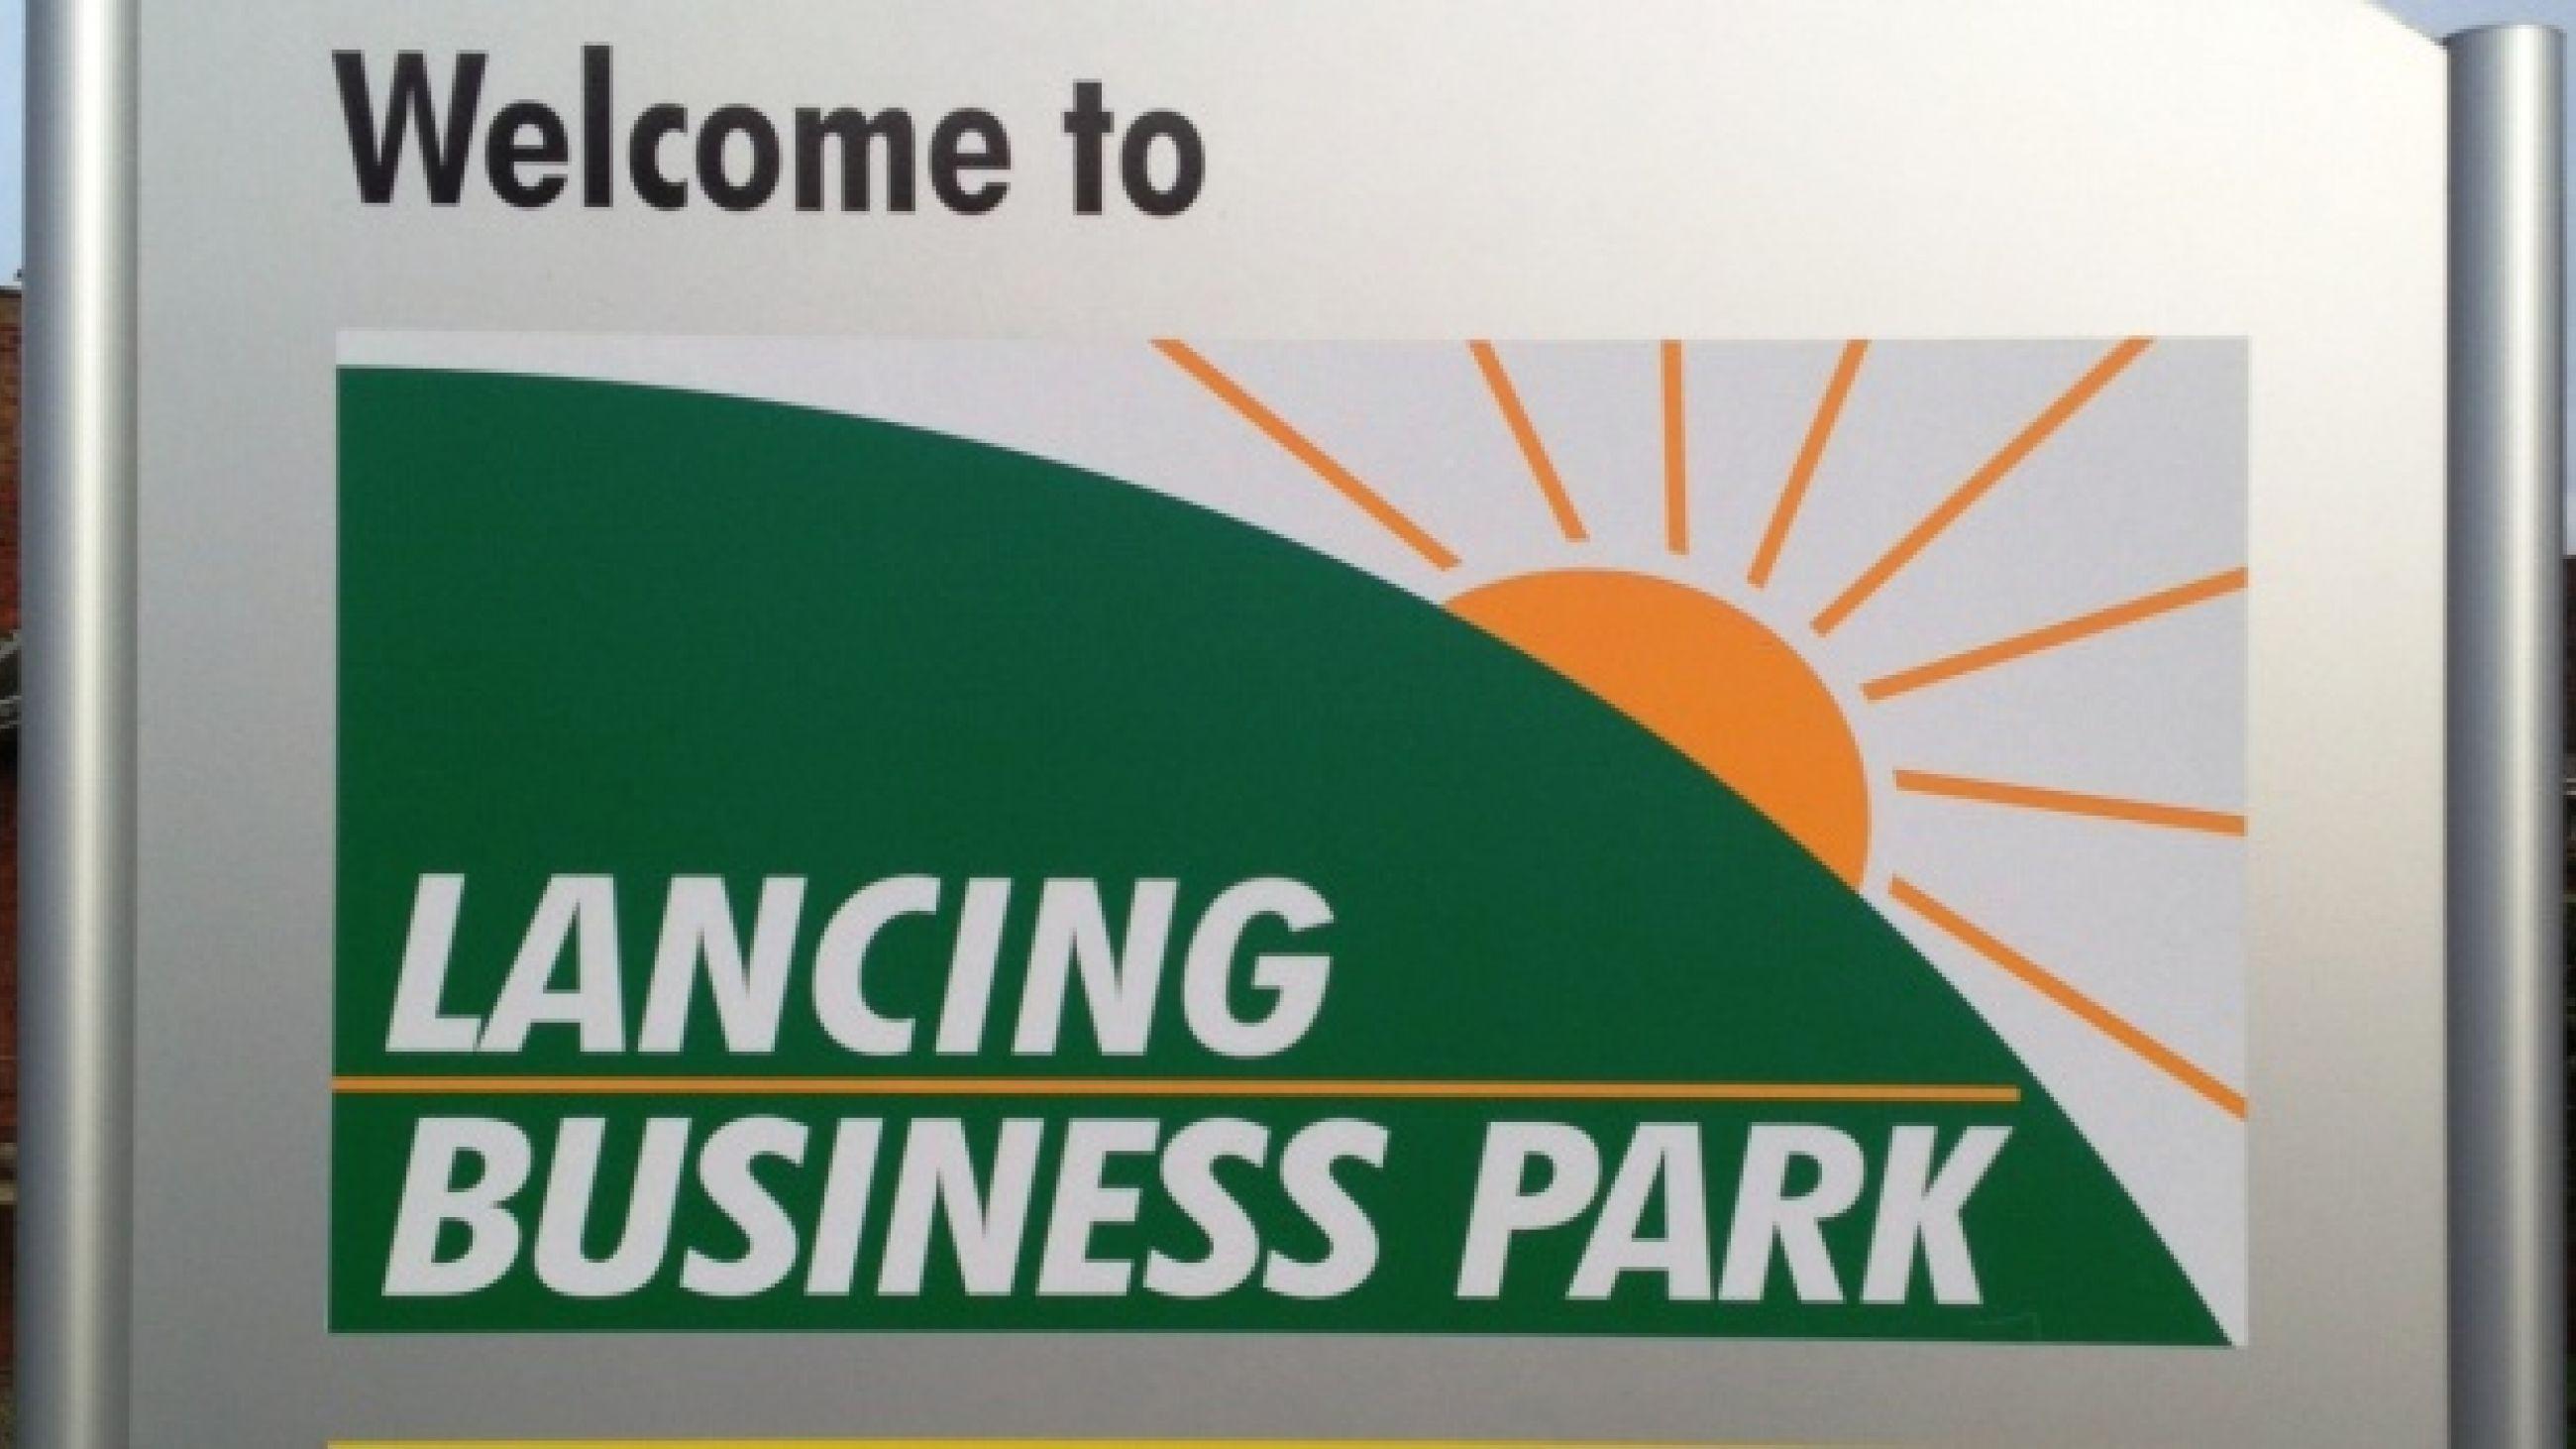 Lancing Business Park second term BID success